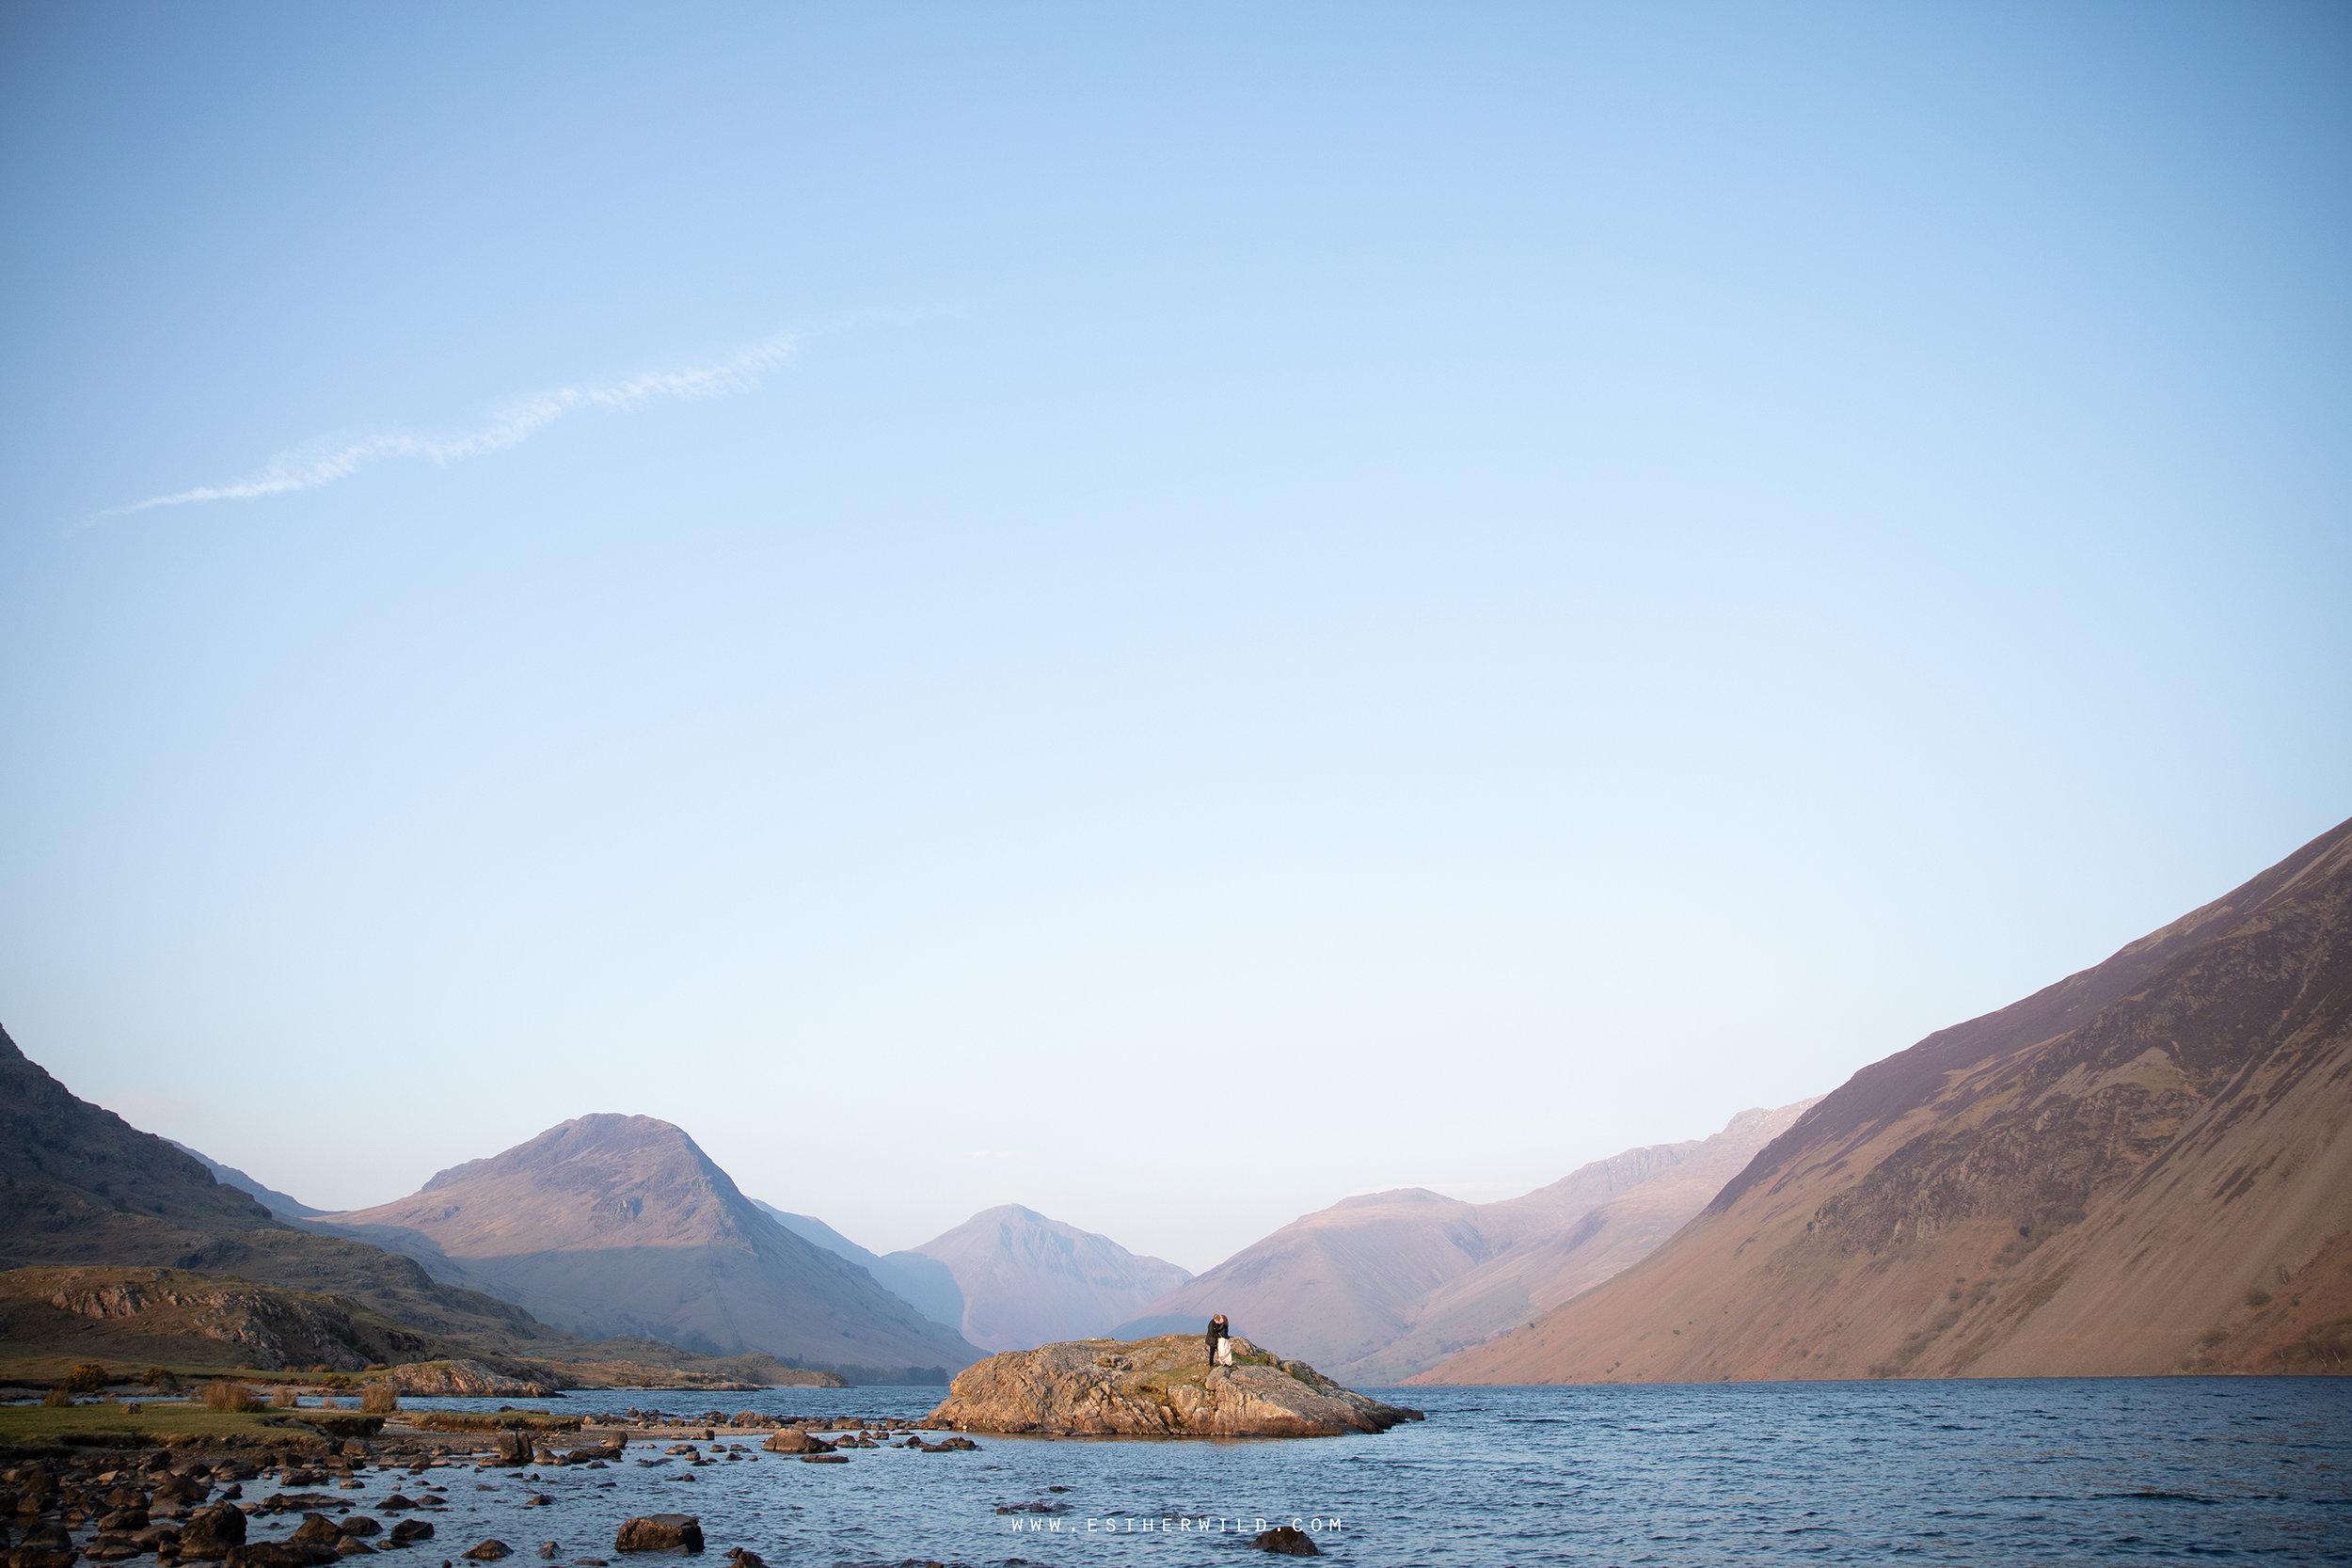 Cumbria_Lake_District_Wasdale_Wedding_Photographer_Destination_Engagement_Anniversary_Esther_Wild_IMG_4592.jpg